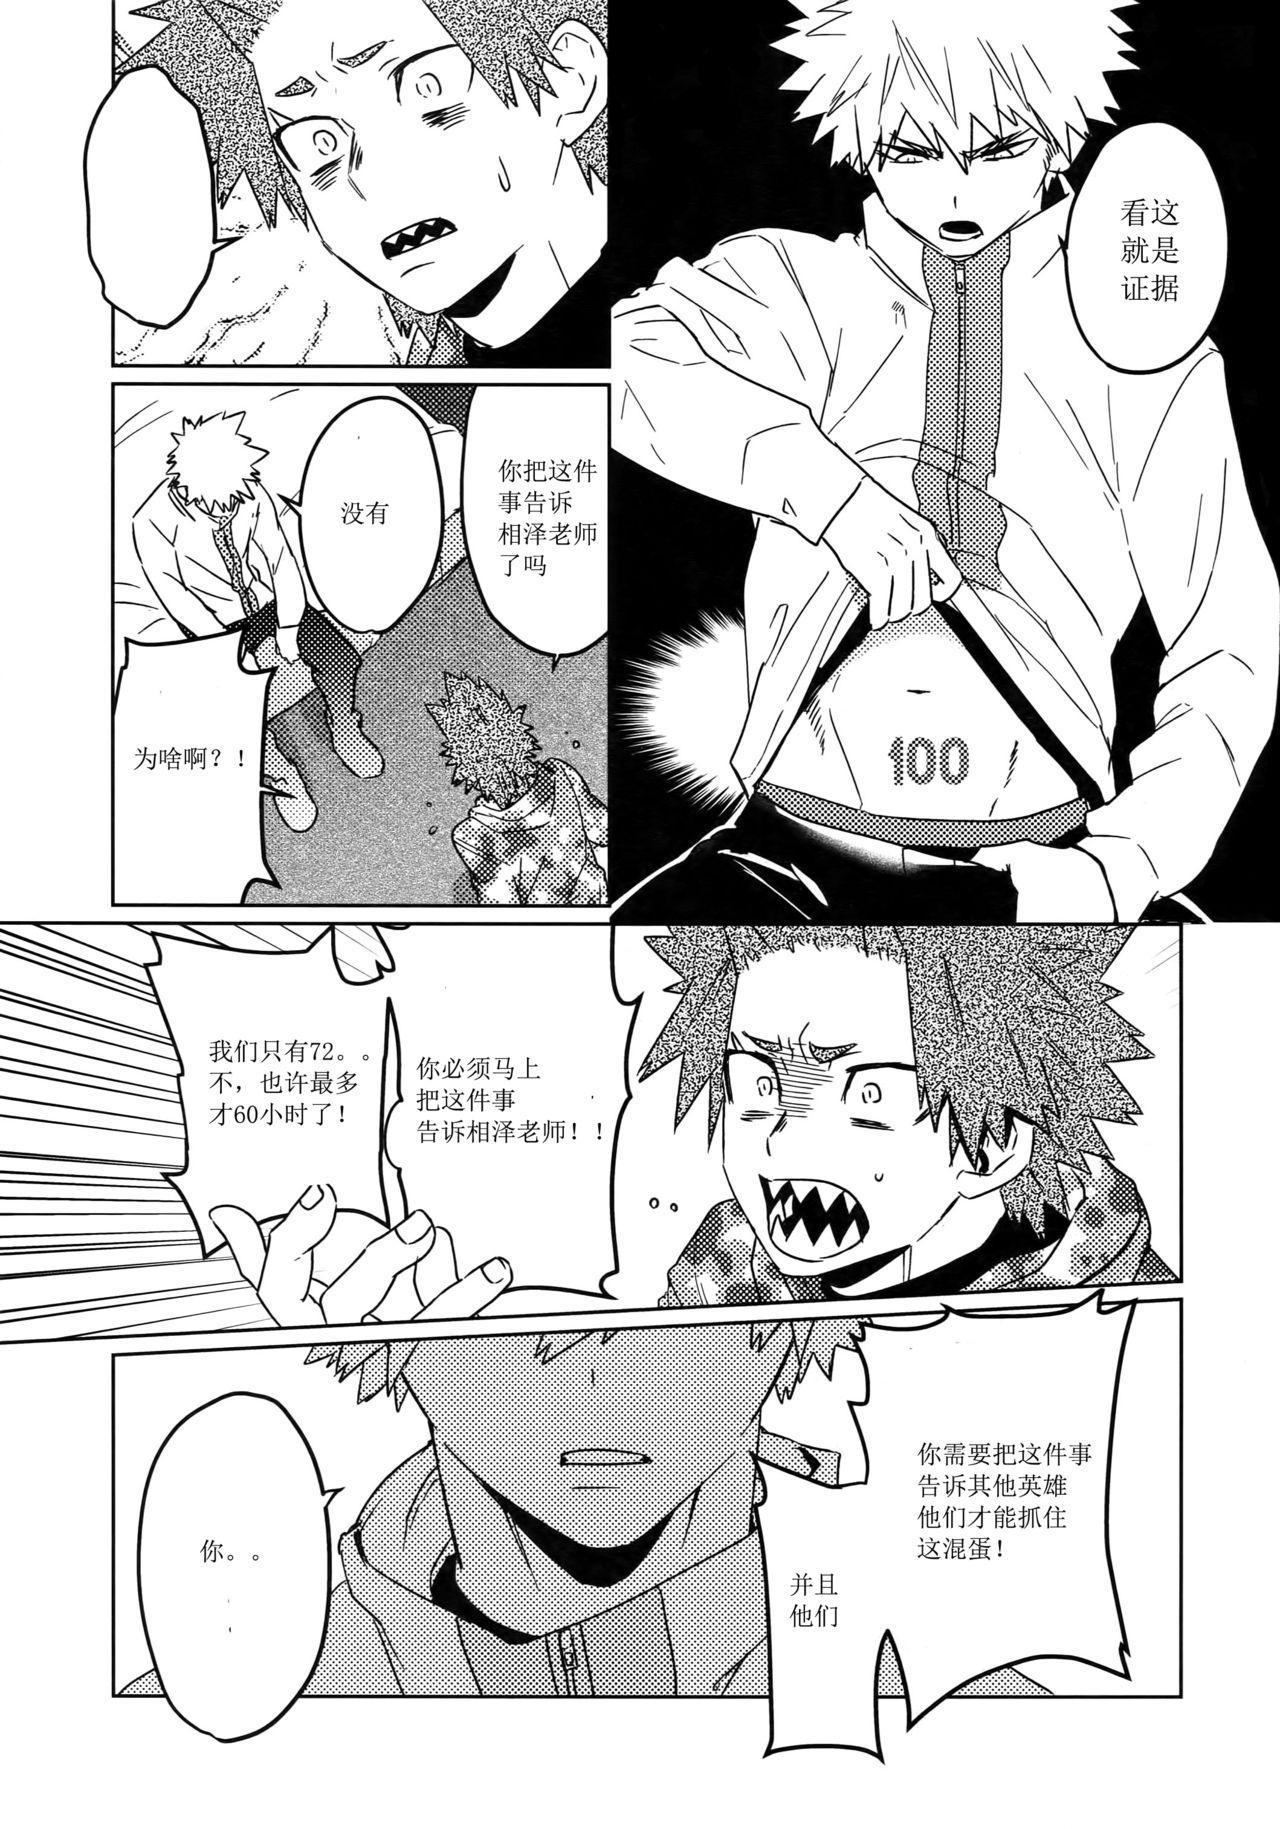 Tasukero ya Red Riot 9